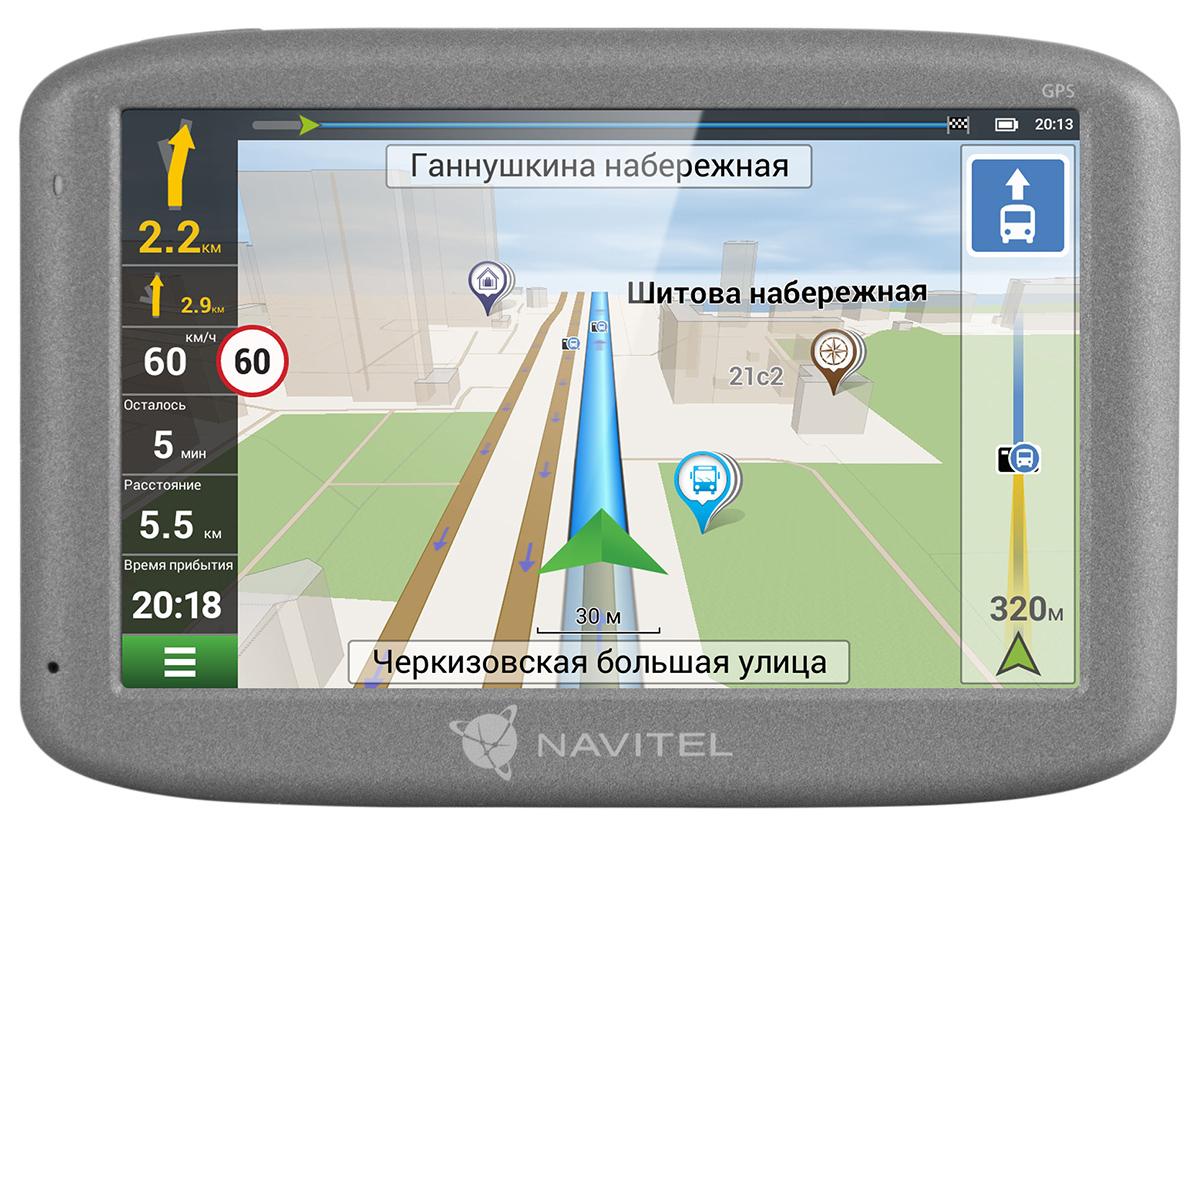 Спутниковый GPS навигатор Navitel N500 gps навигатор для пешехода